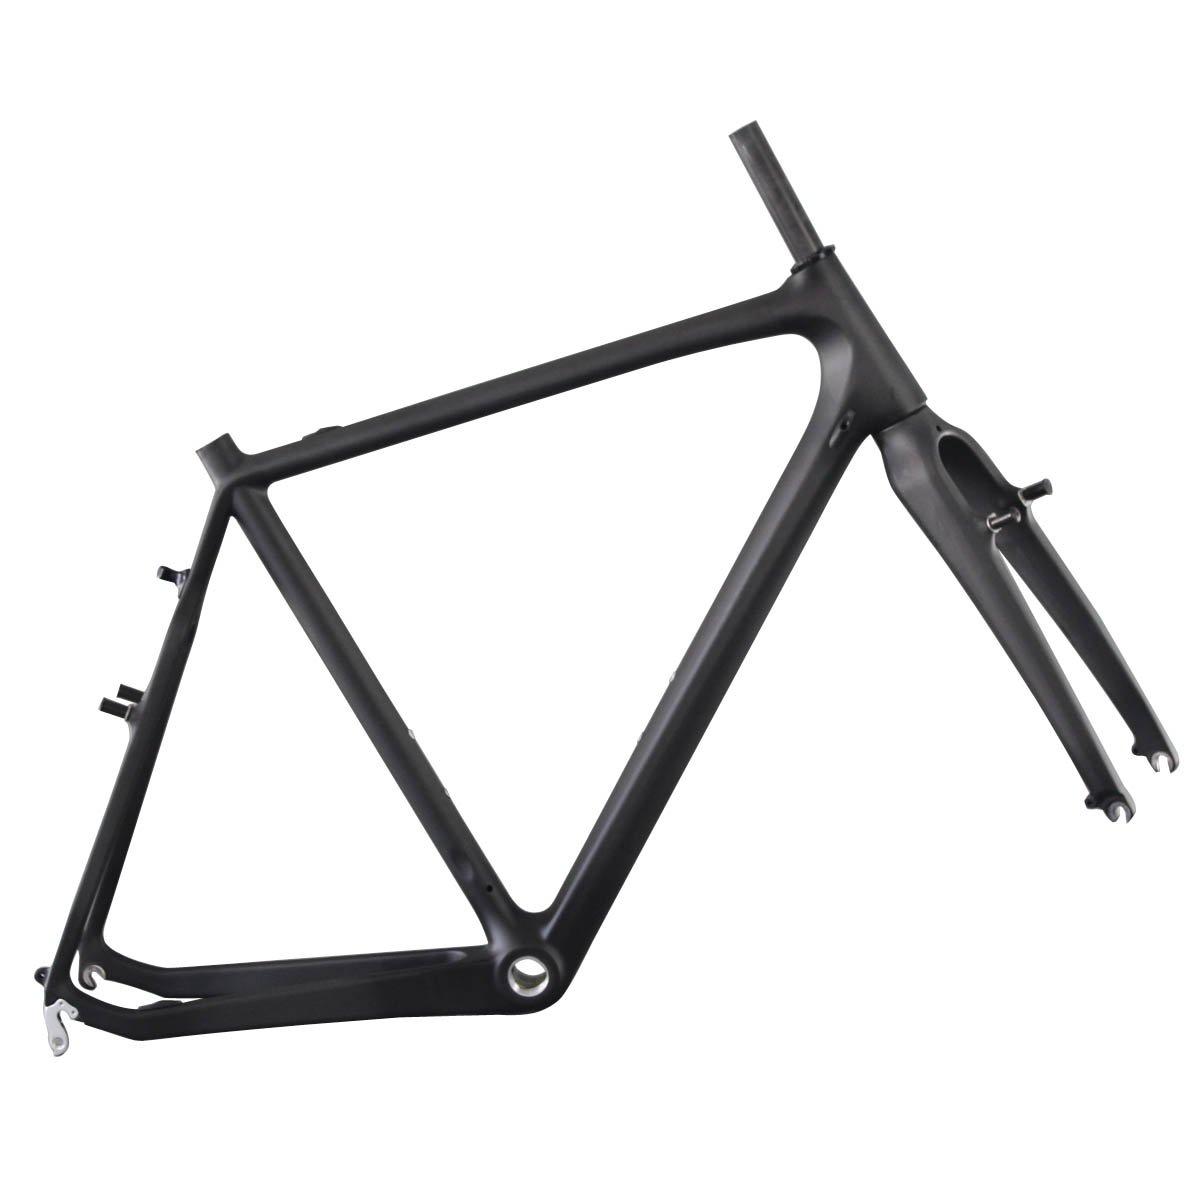 ican carbon cyclocross road bike